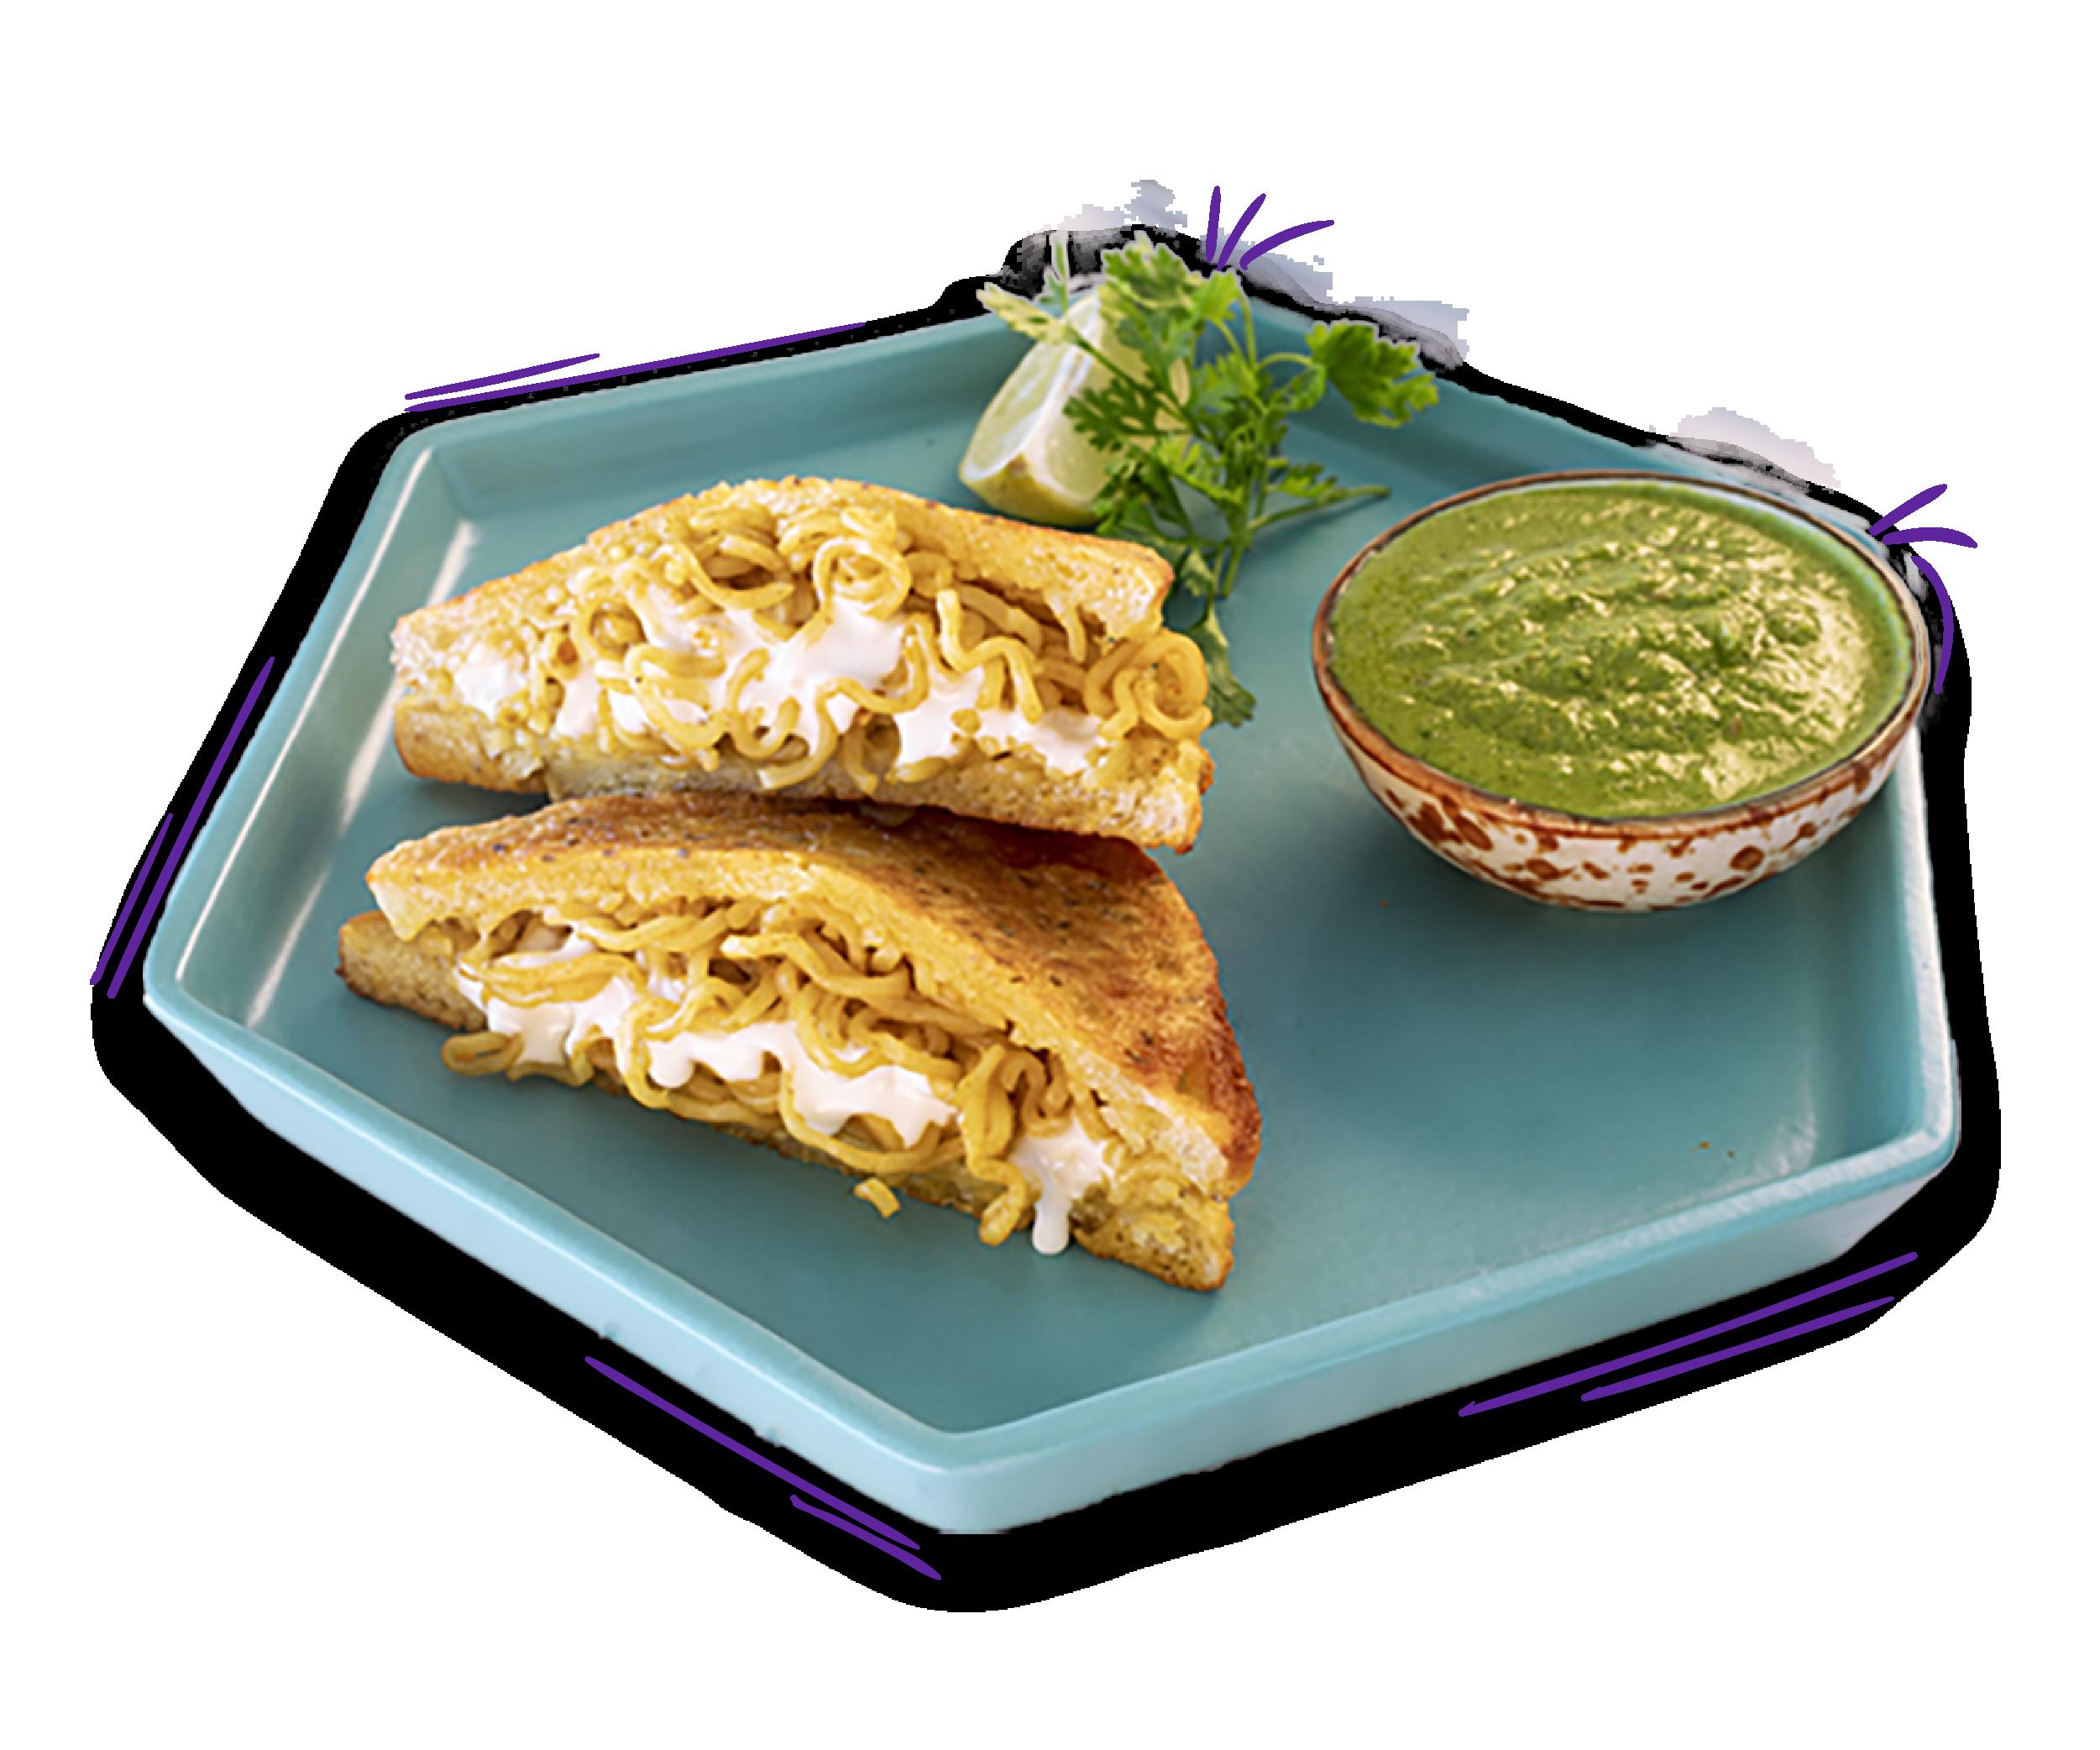 YiPPee! MOOD MASALA – Noodle Cheese Bread Pakora Recipe